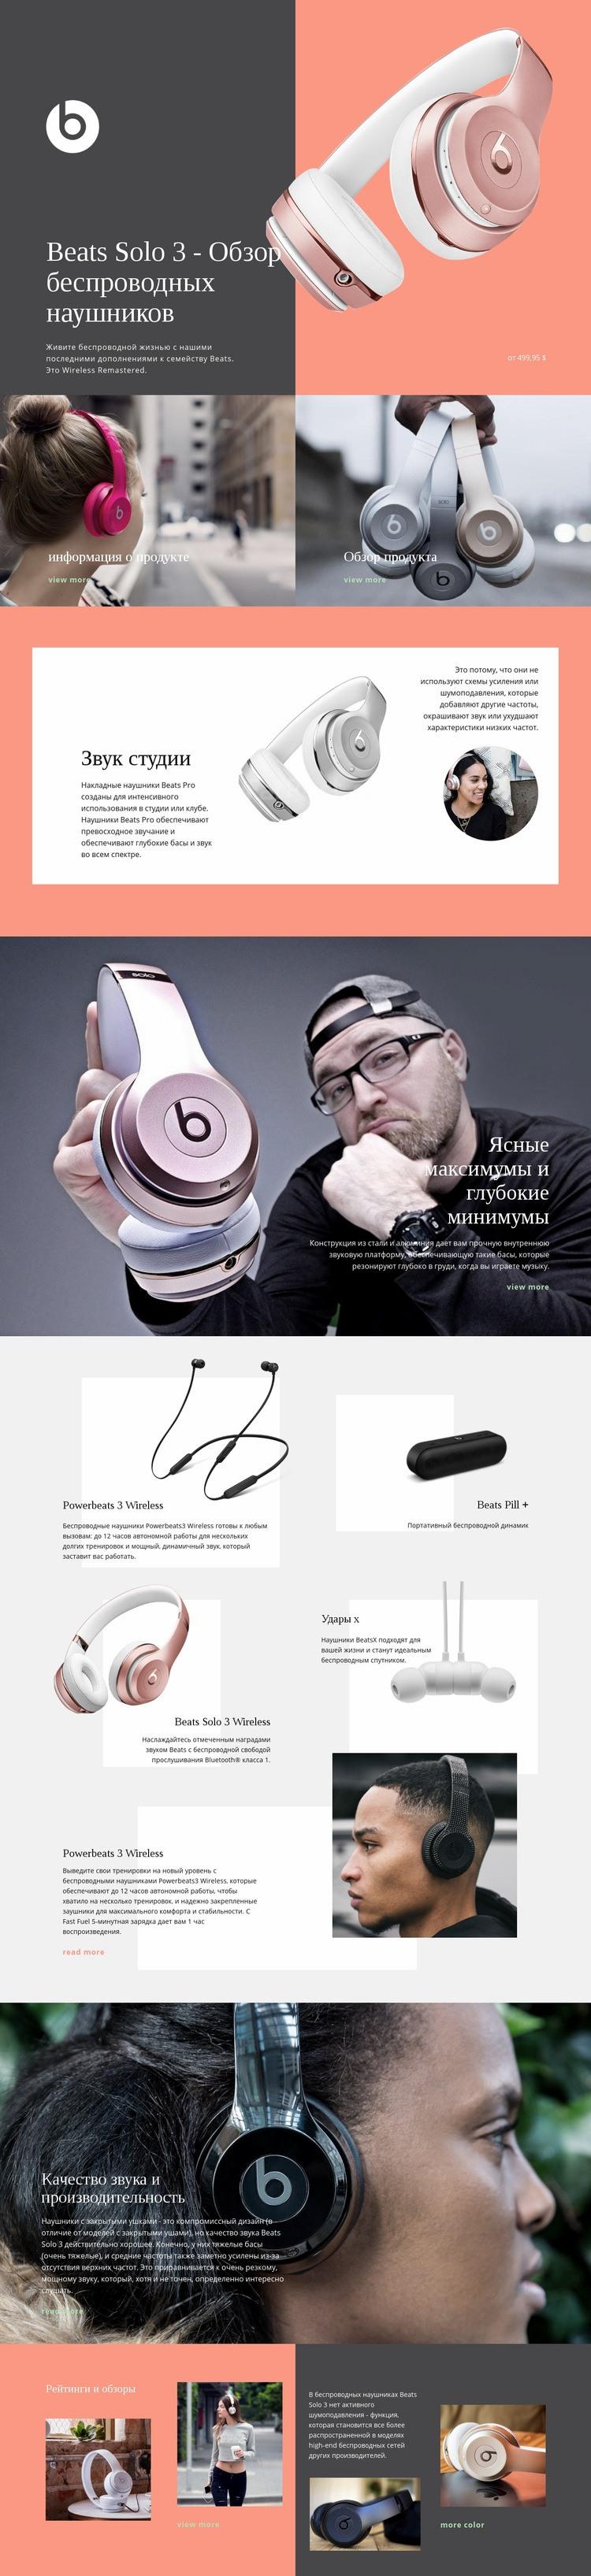 Beats Wireless Шаблон веб-сайта